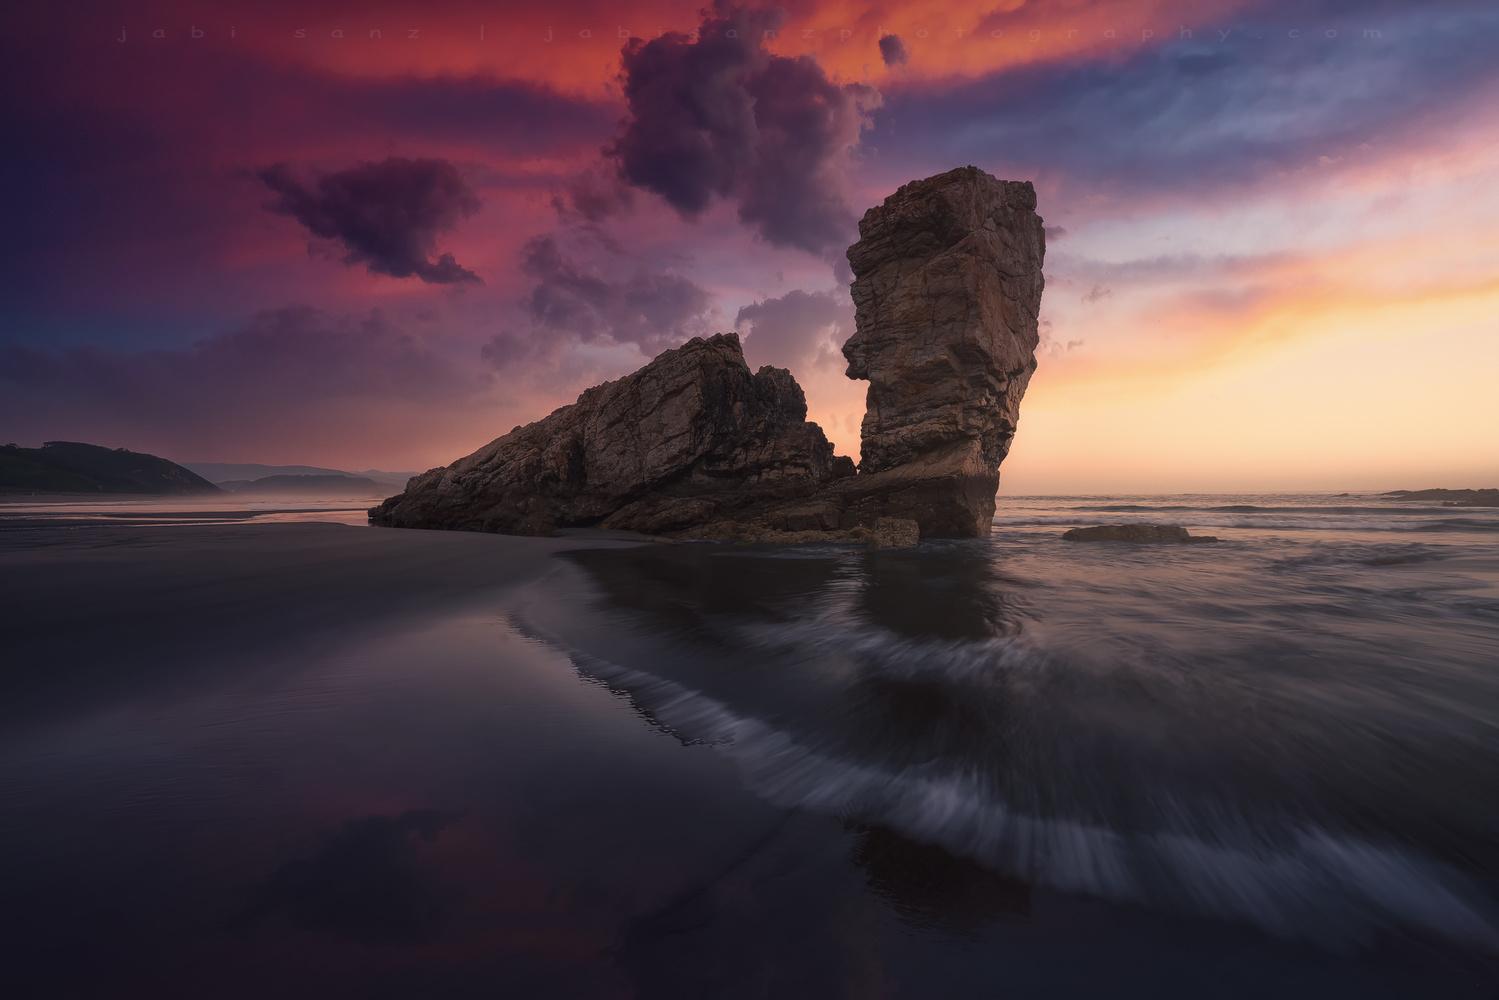 The Rock by jabi sanz